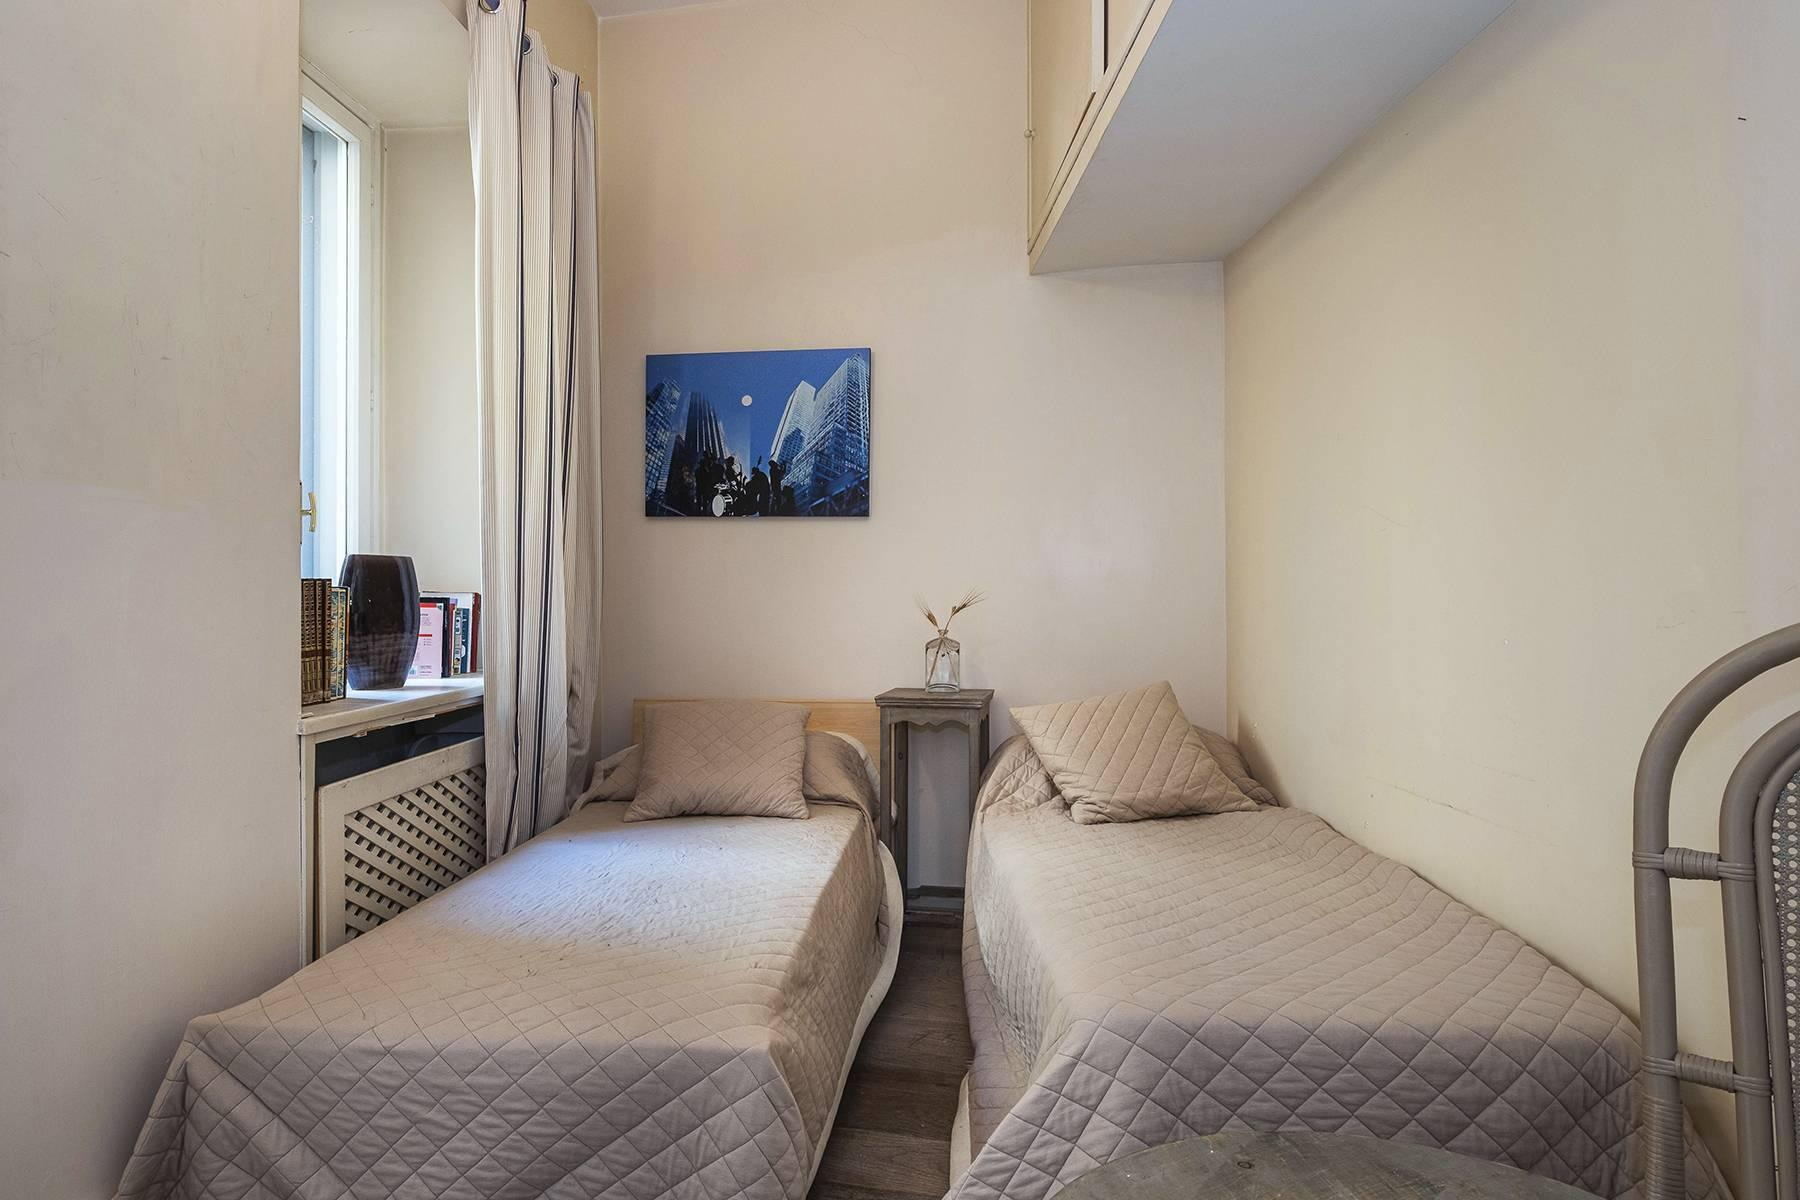 Affascinante appartamento a due passi dal Palatino - 11